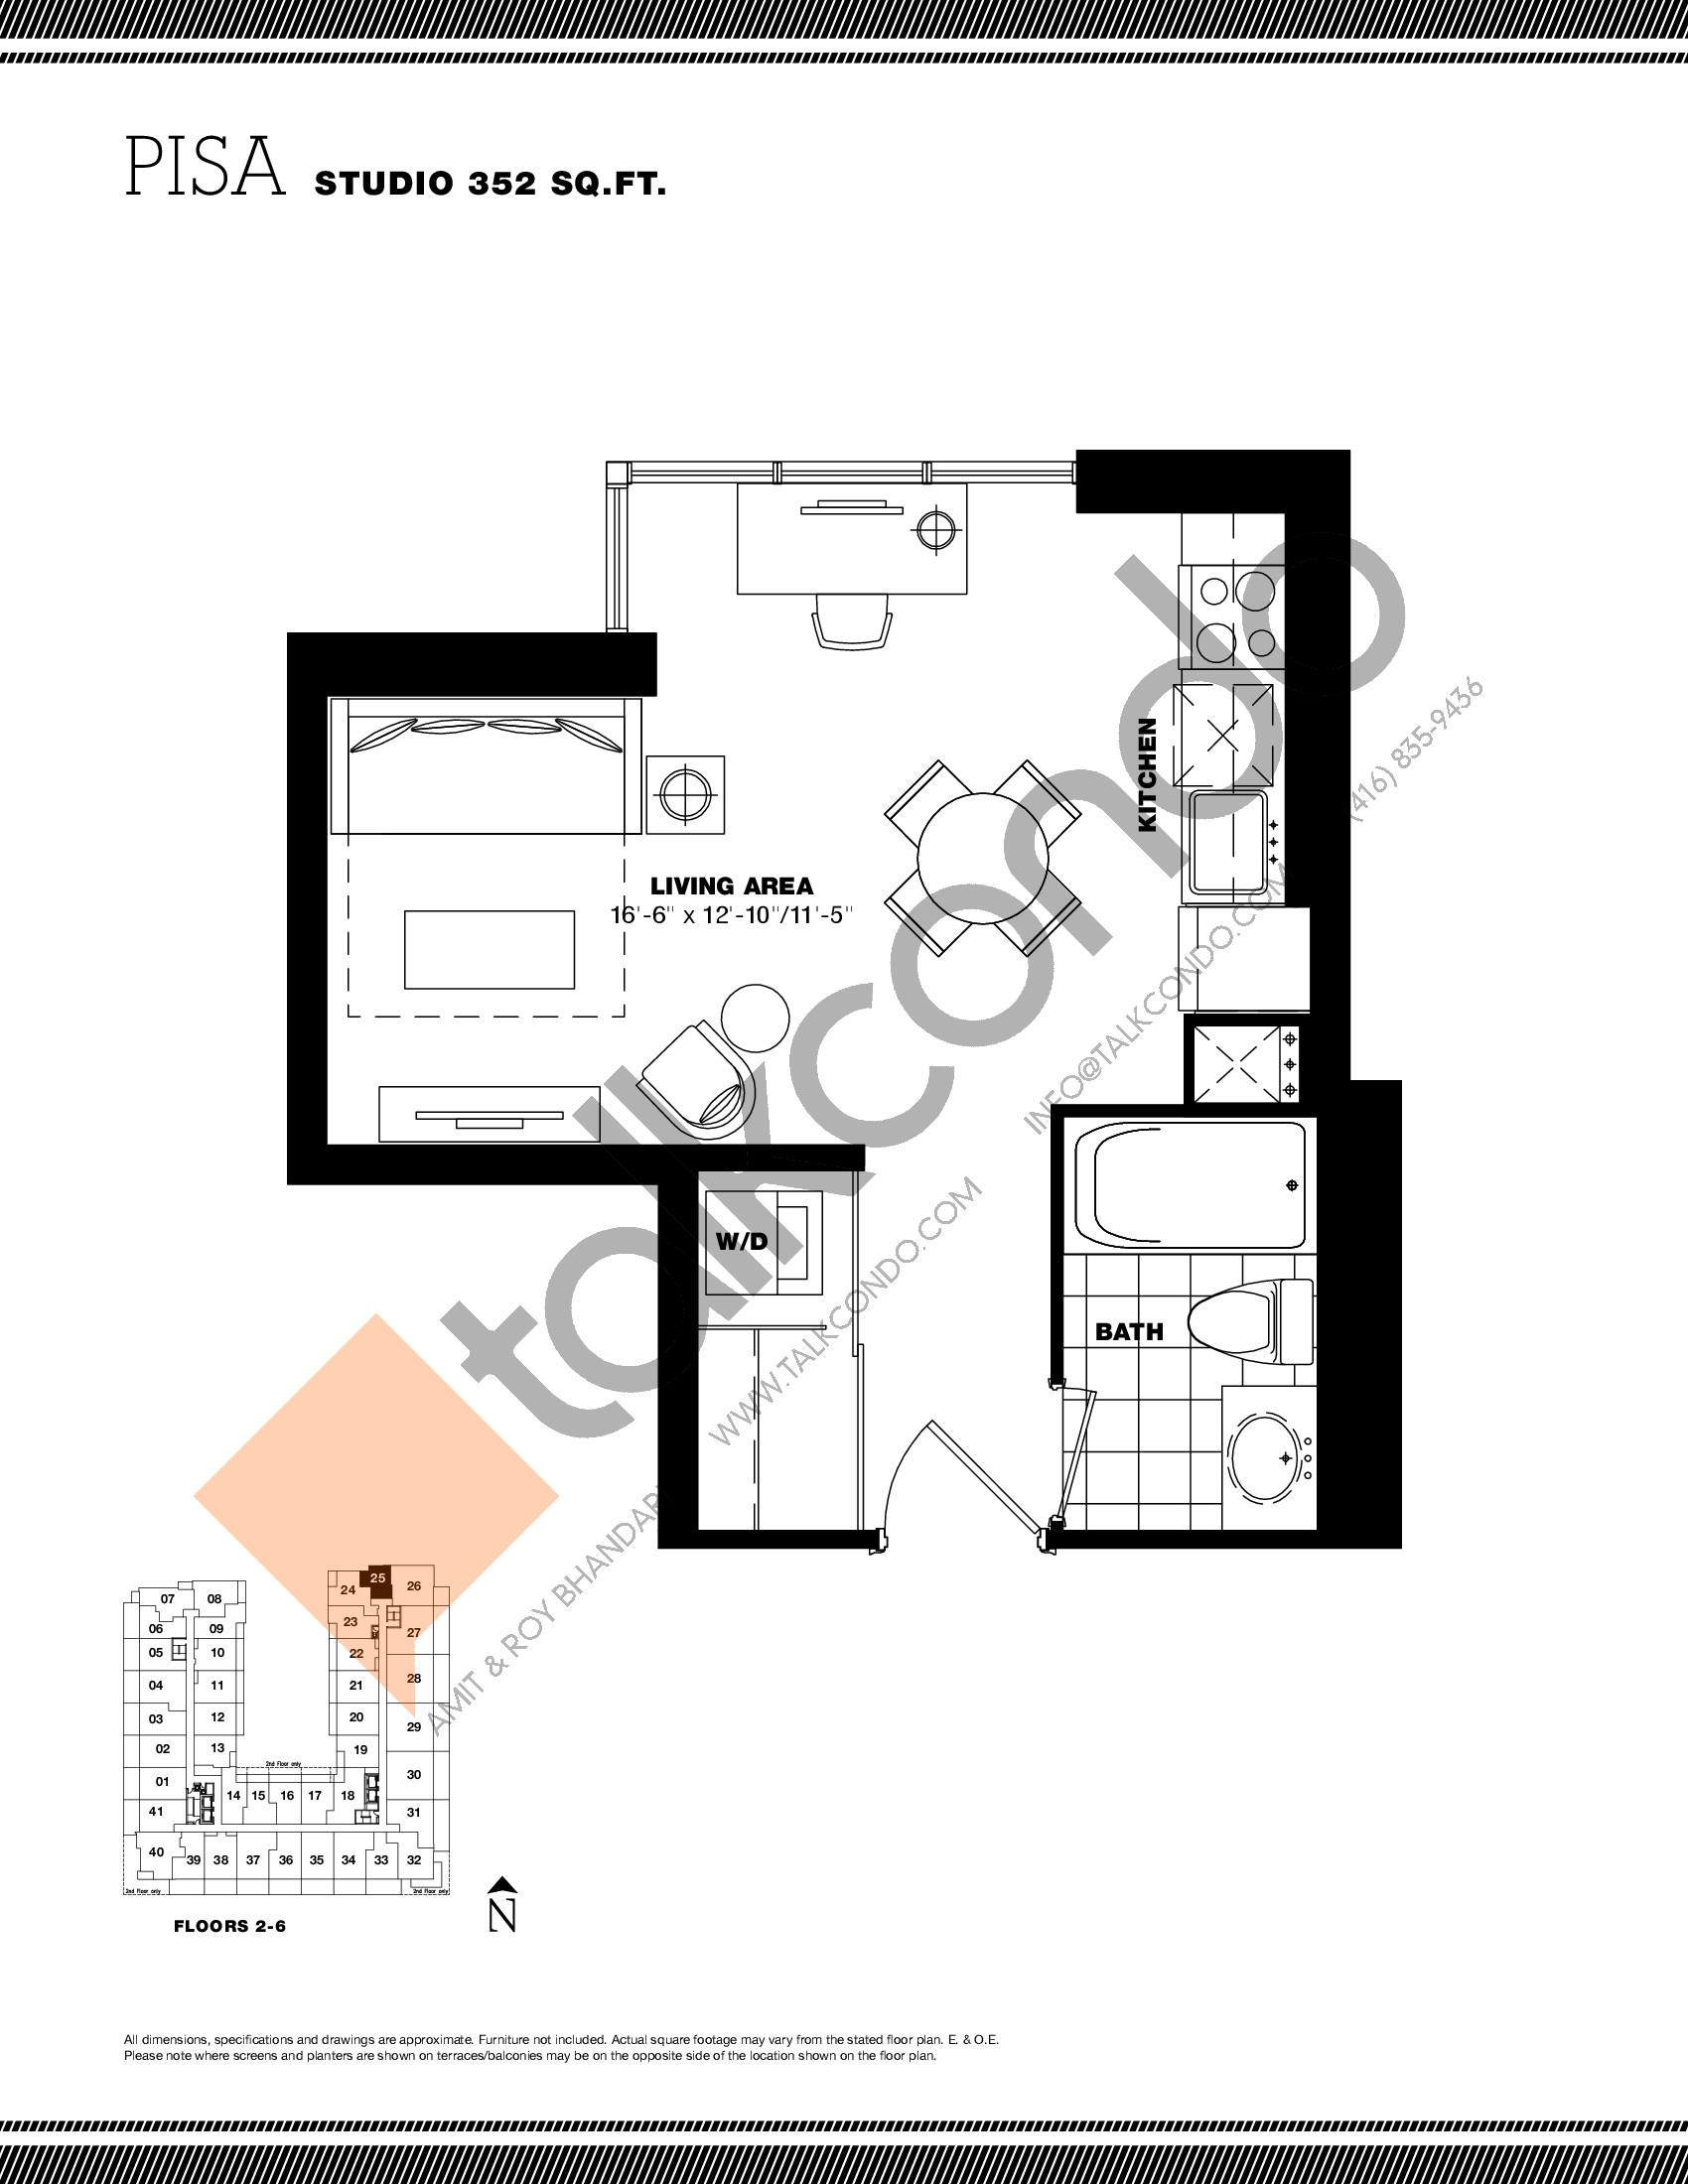 Pisa Floor Plan at Residenze Palazzo at Treviso 3 Condos - 352 sq.ft